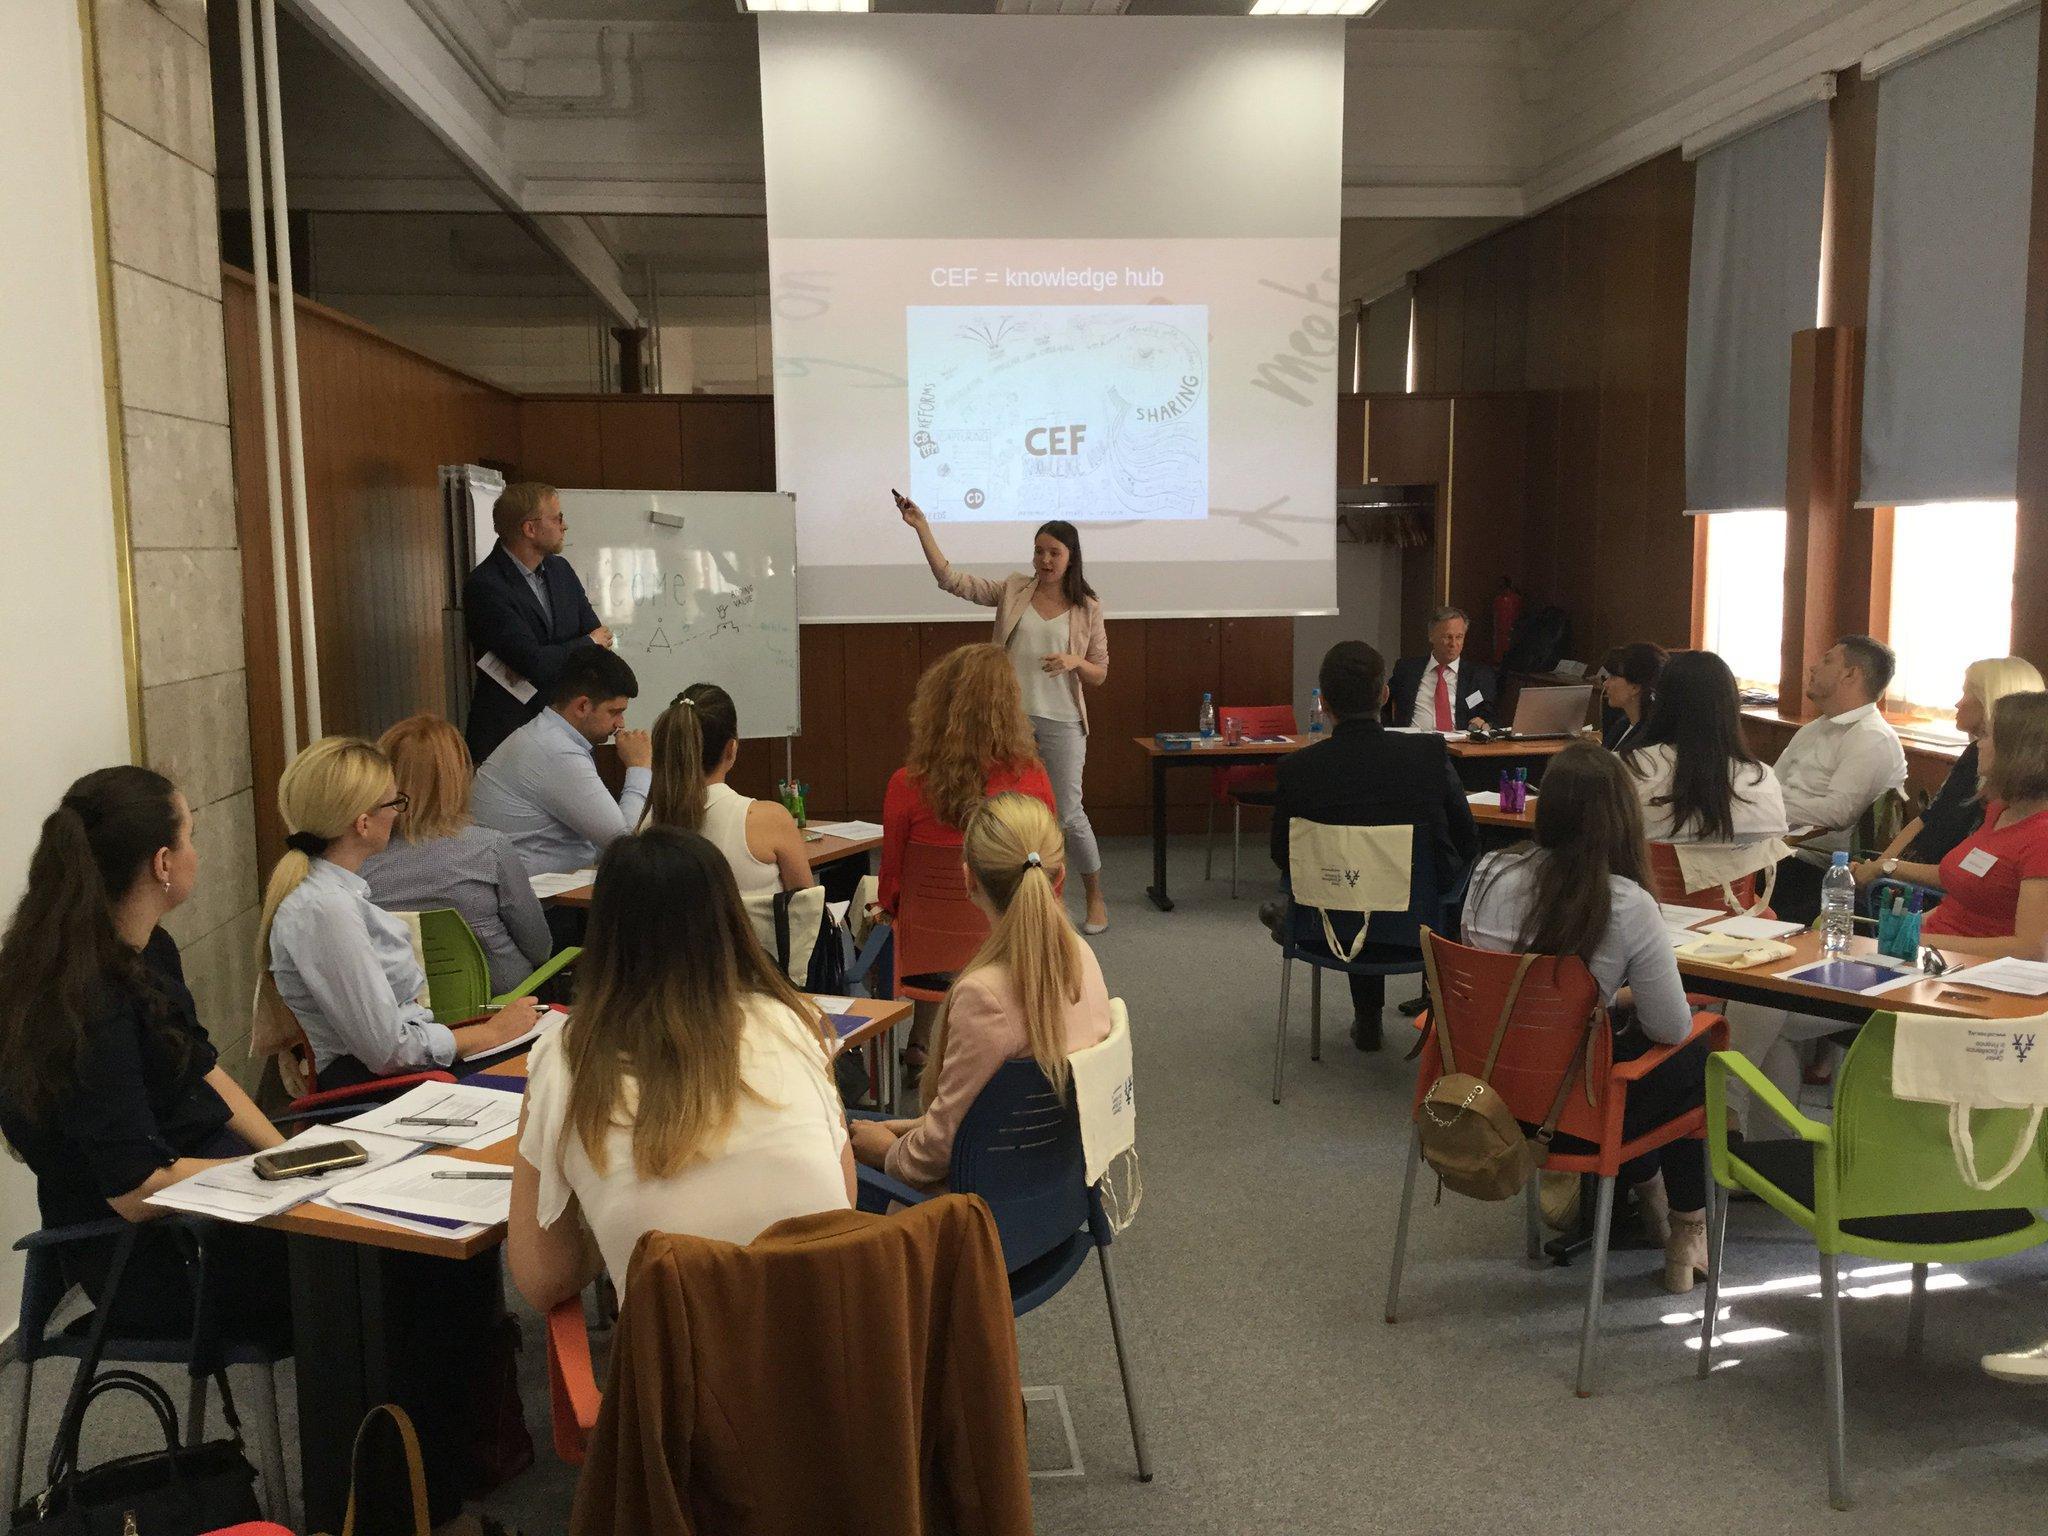 Third #CEF #regional workshop under #PIFC program has just started #InternalAuditingForNonAuditors #PublicInternalControl https://t.co/bkGKBreSPU